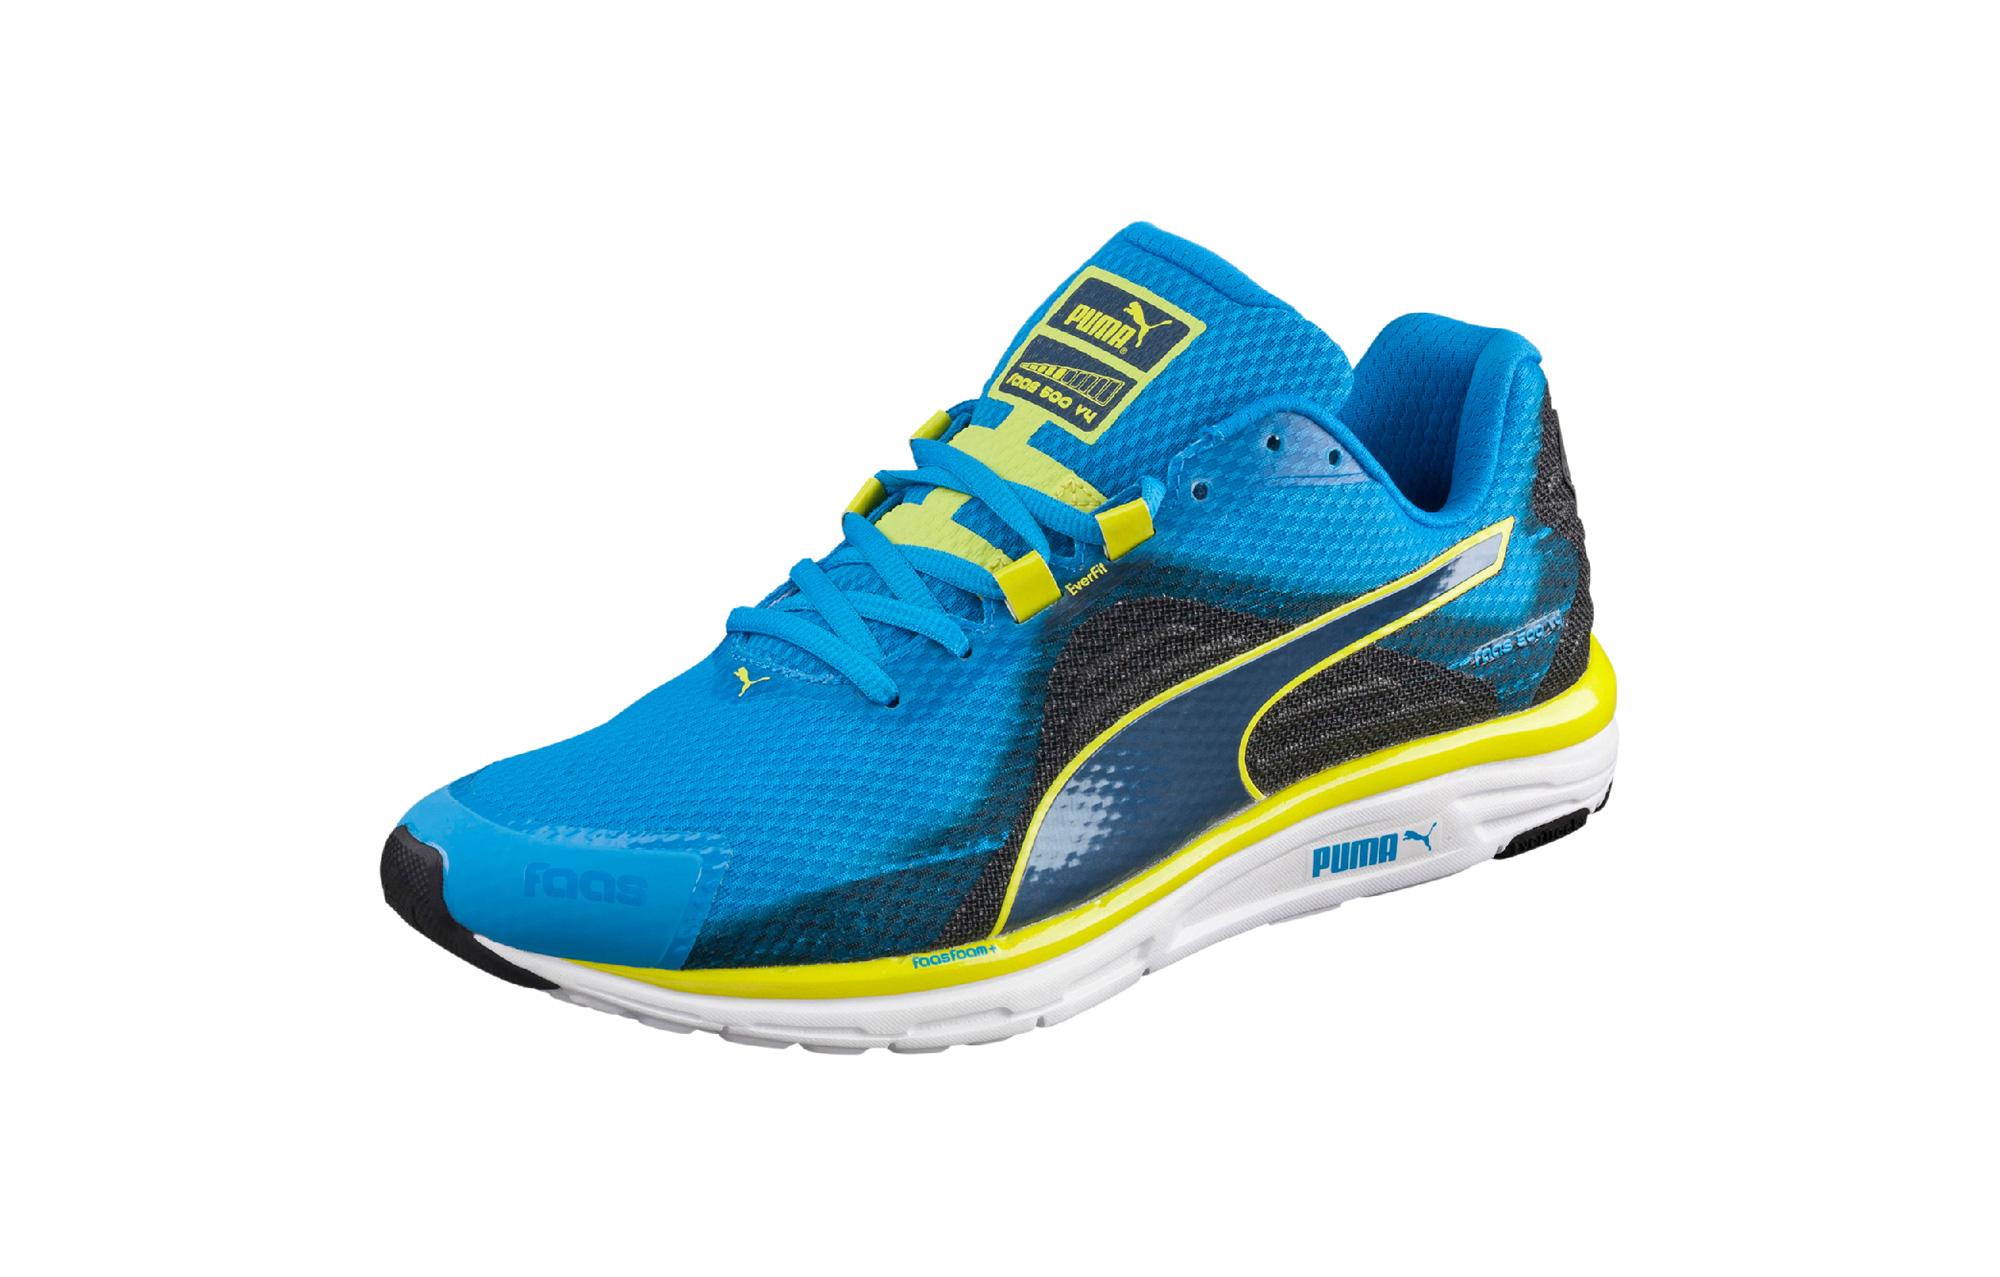 chaussure running puma faas 500,vetement running homme